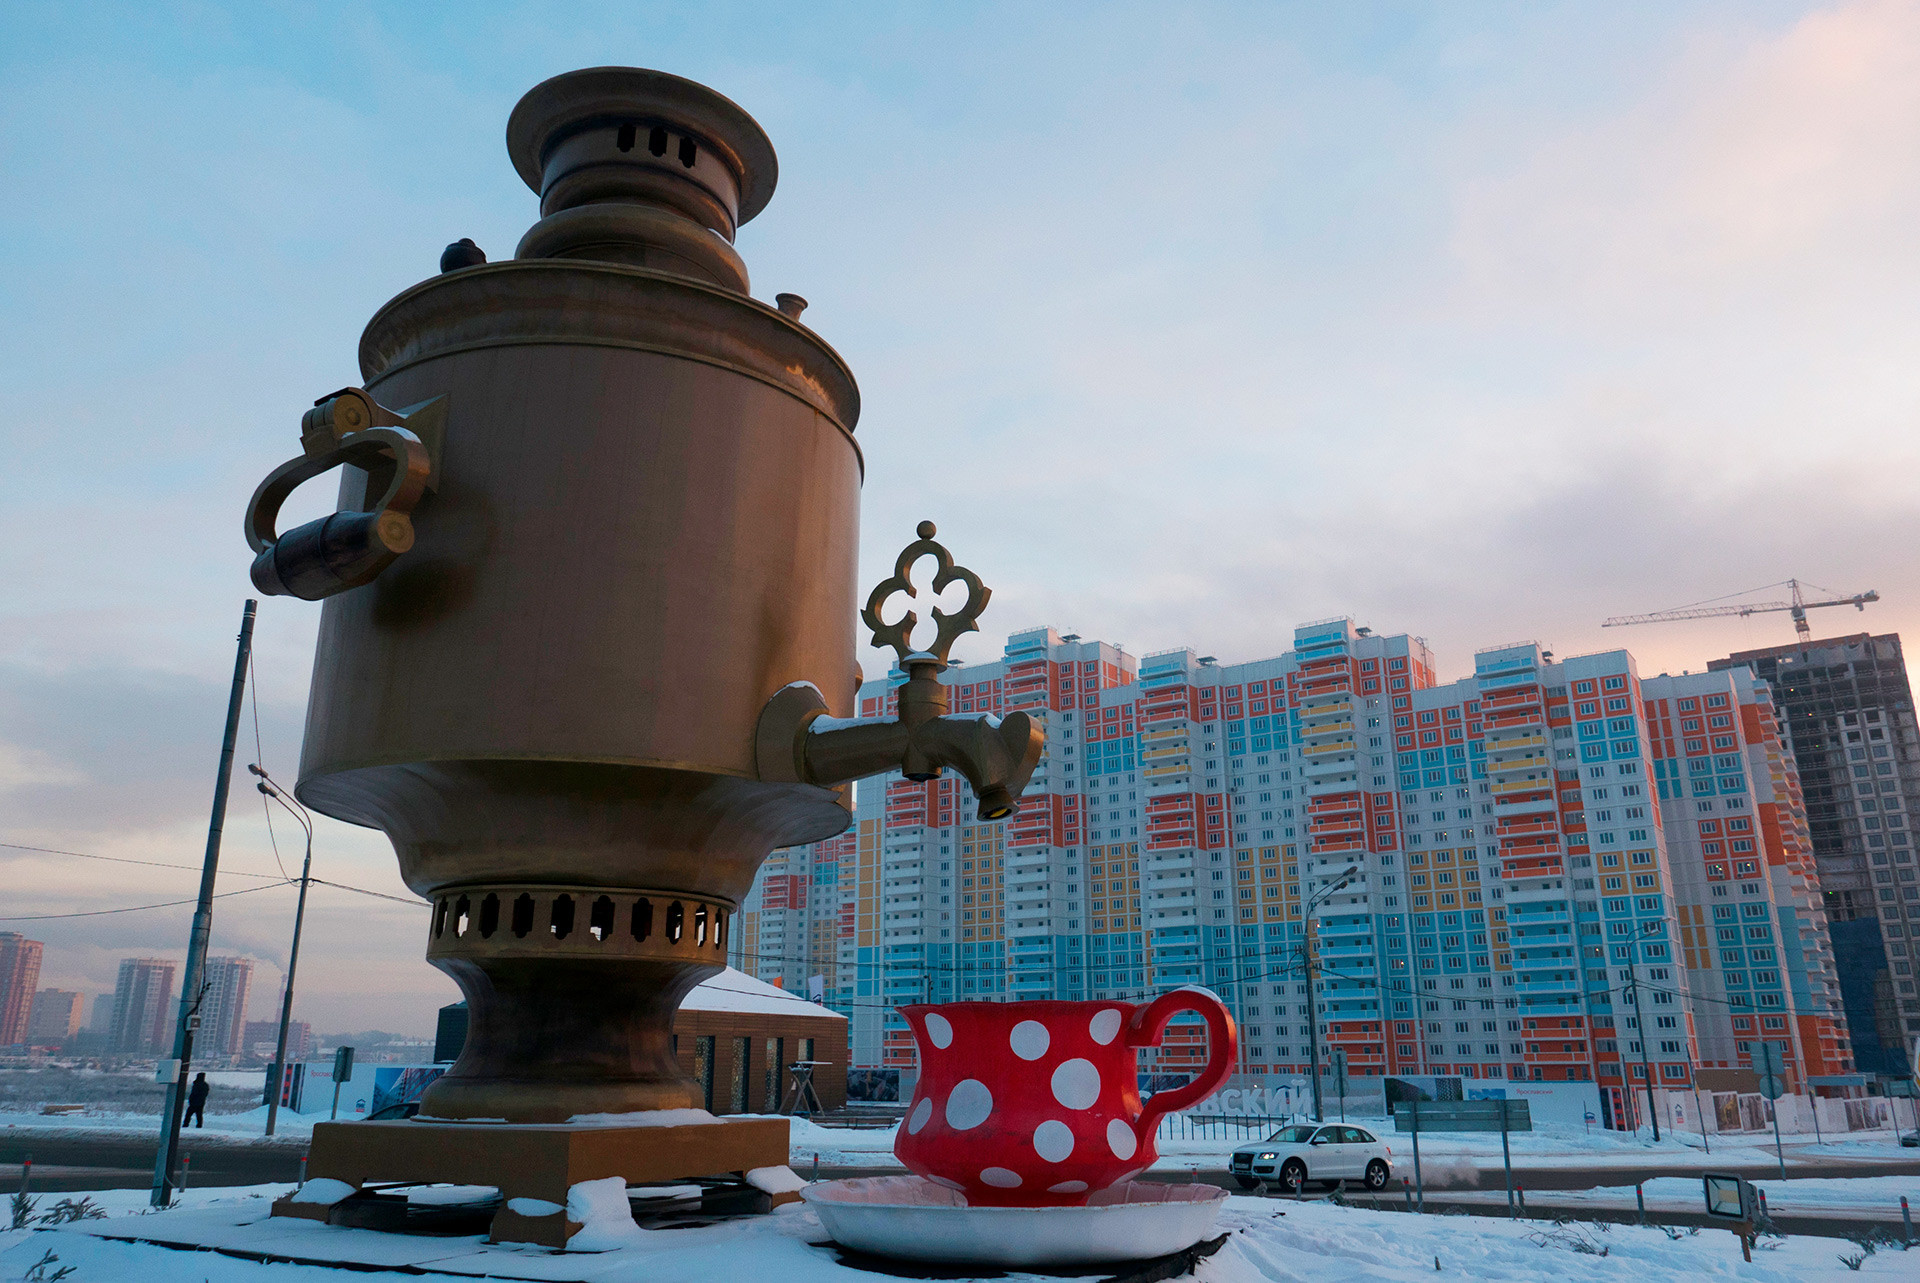 Escultura de samovar de oito metros de altura na cidade de Mitischi, nos arredores de Moscou.